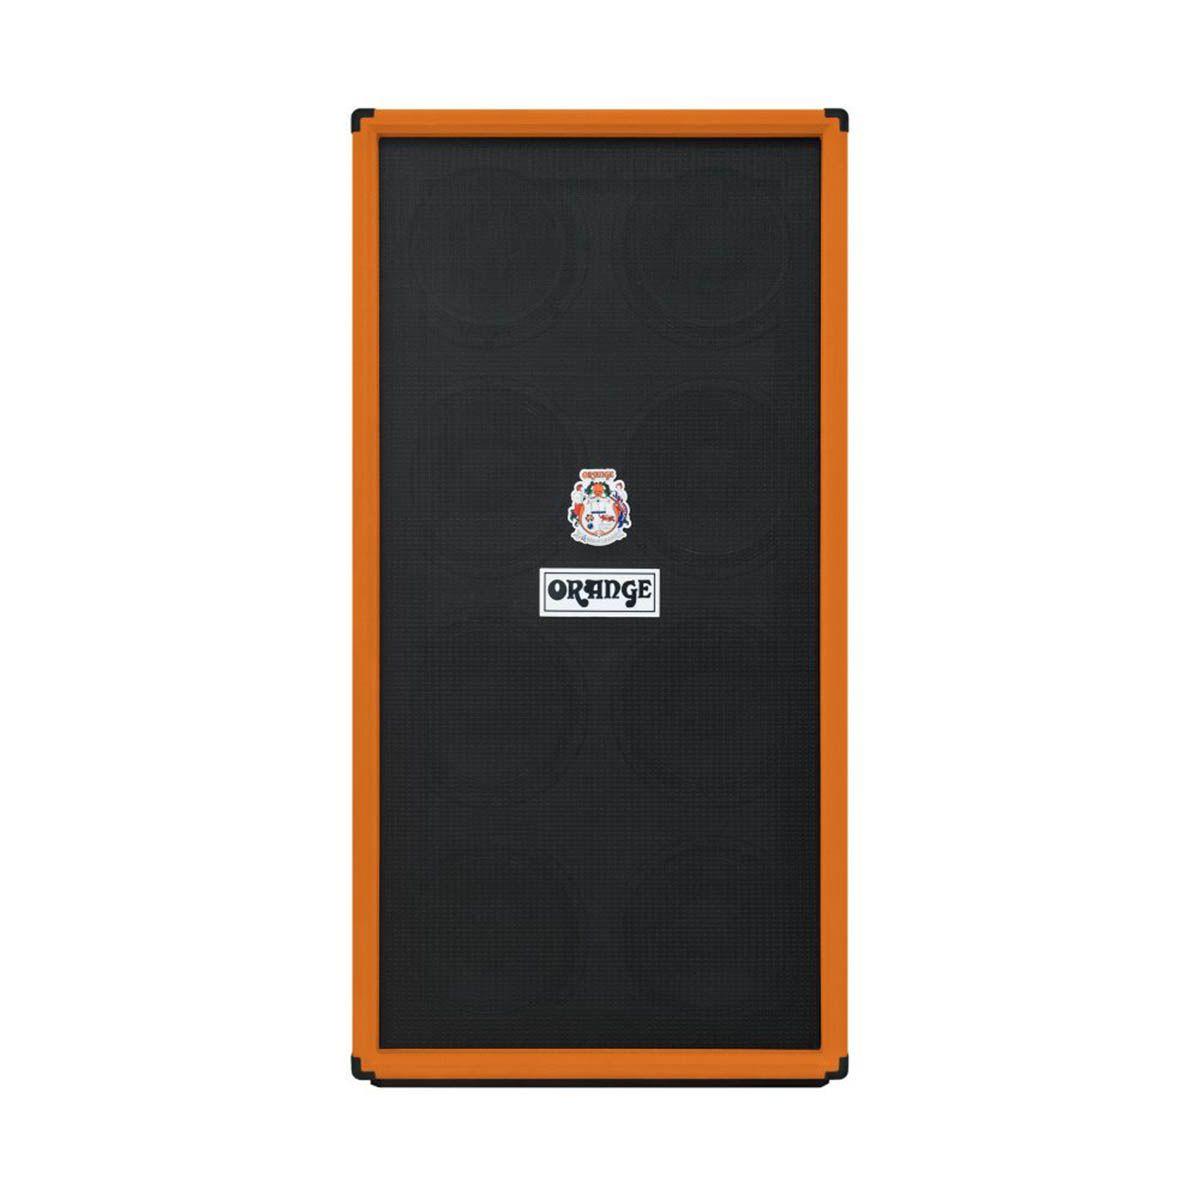 Gabinete Orange OBC810 8x10 1600W para Contrabaixo